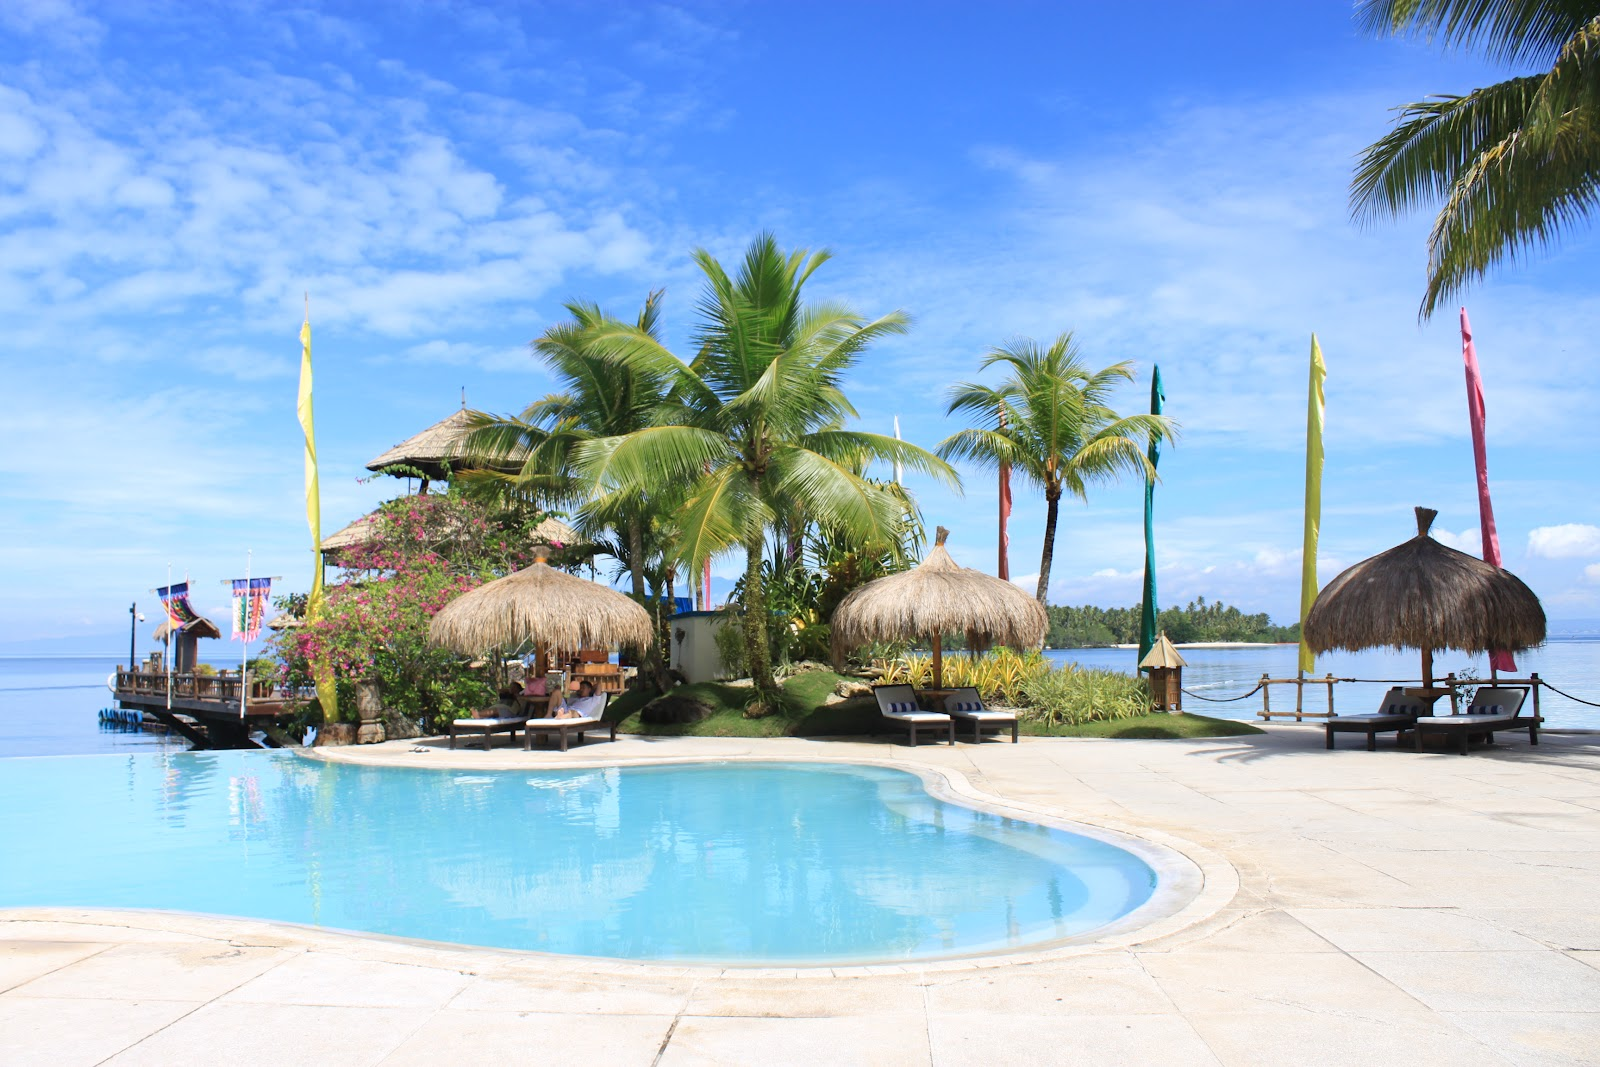 Pearl Farm Resort Island Garden City Of Samal Davao Del Norte B L A S T Live Life To The